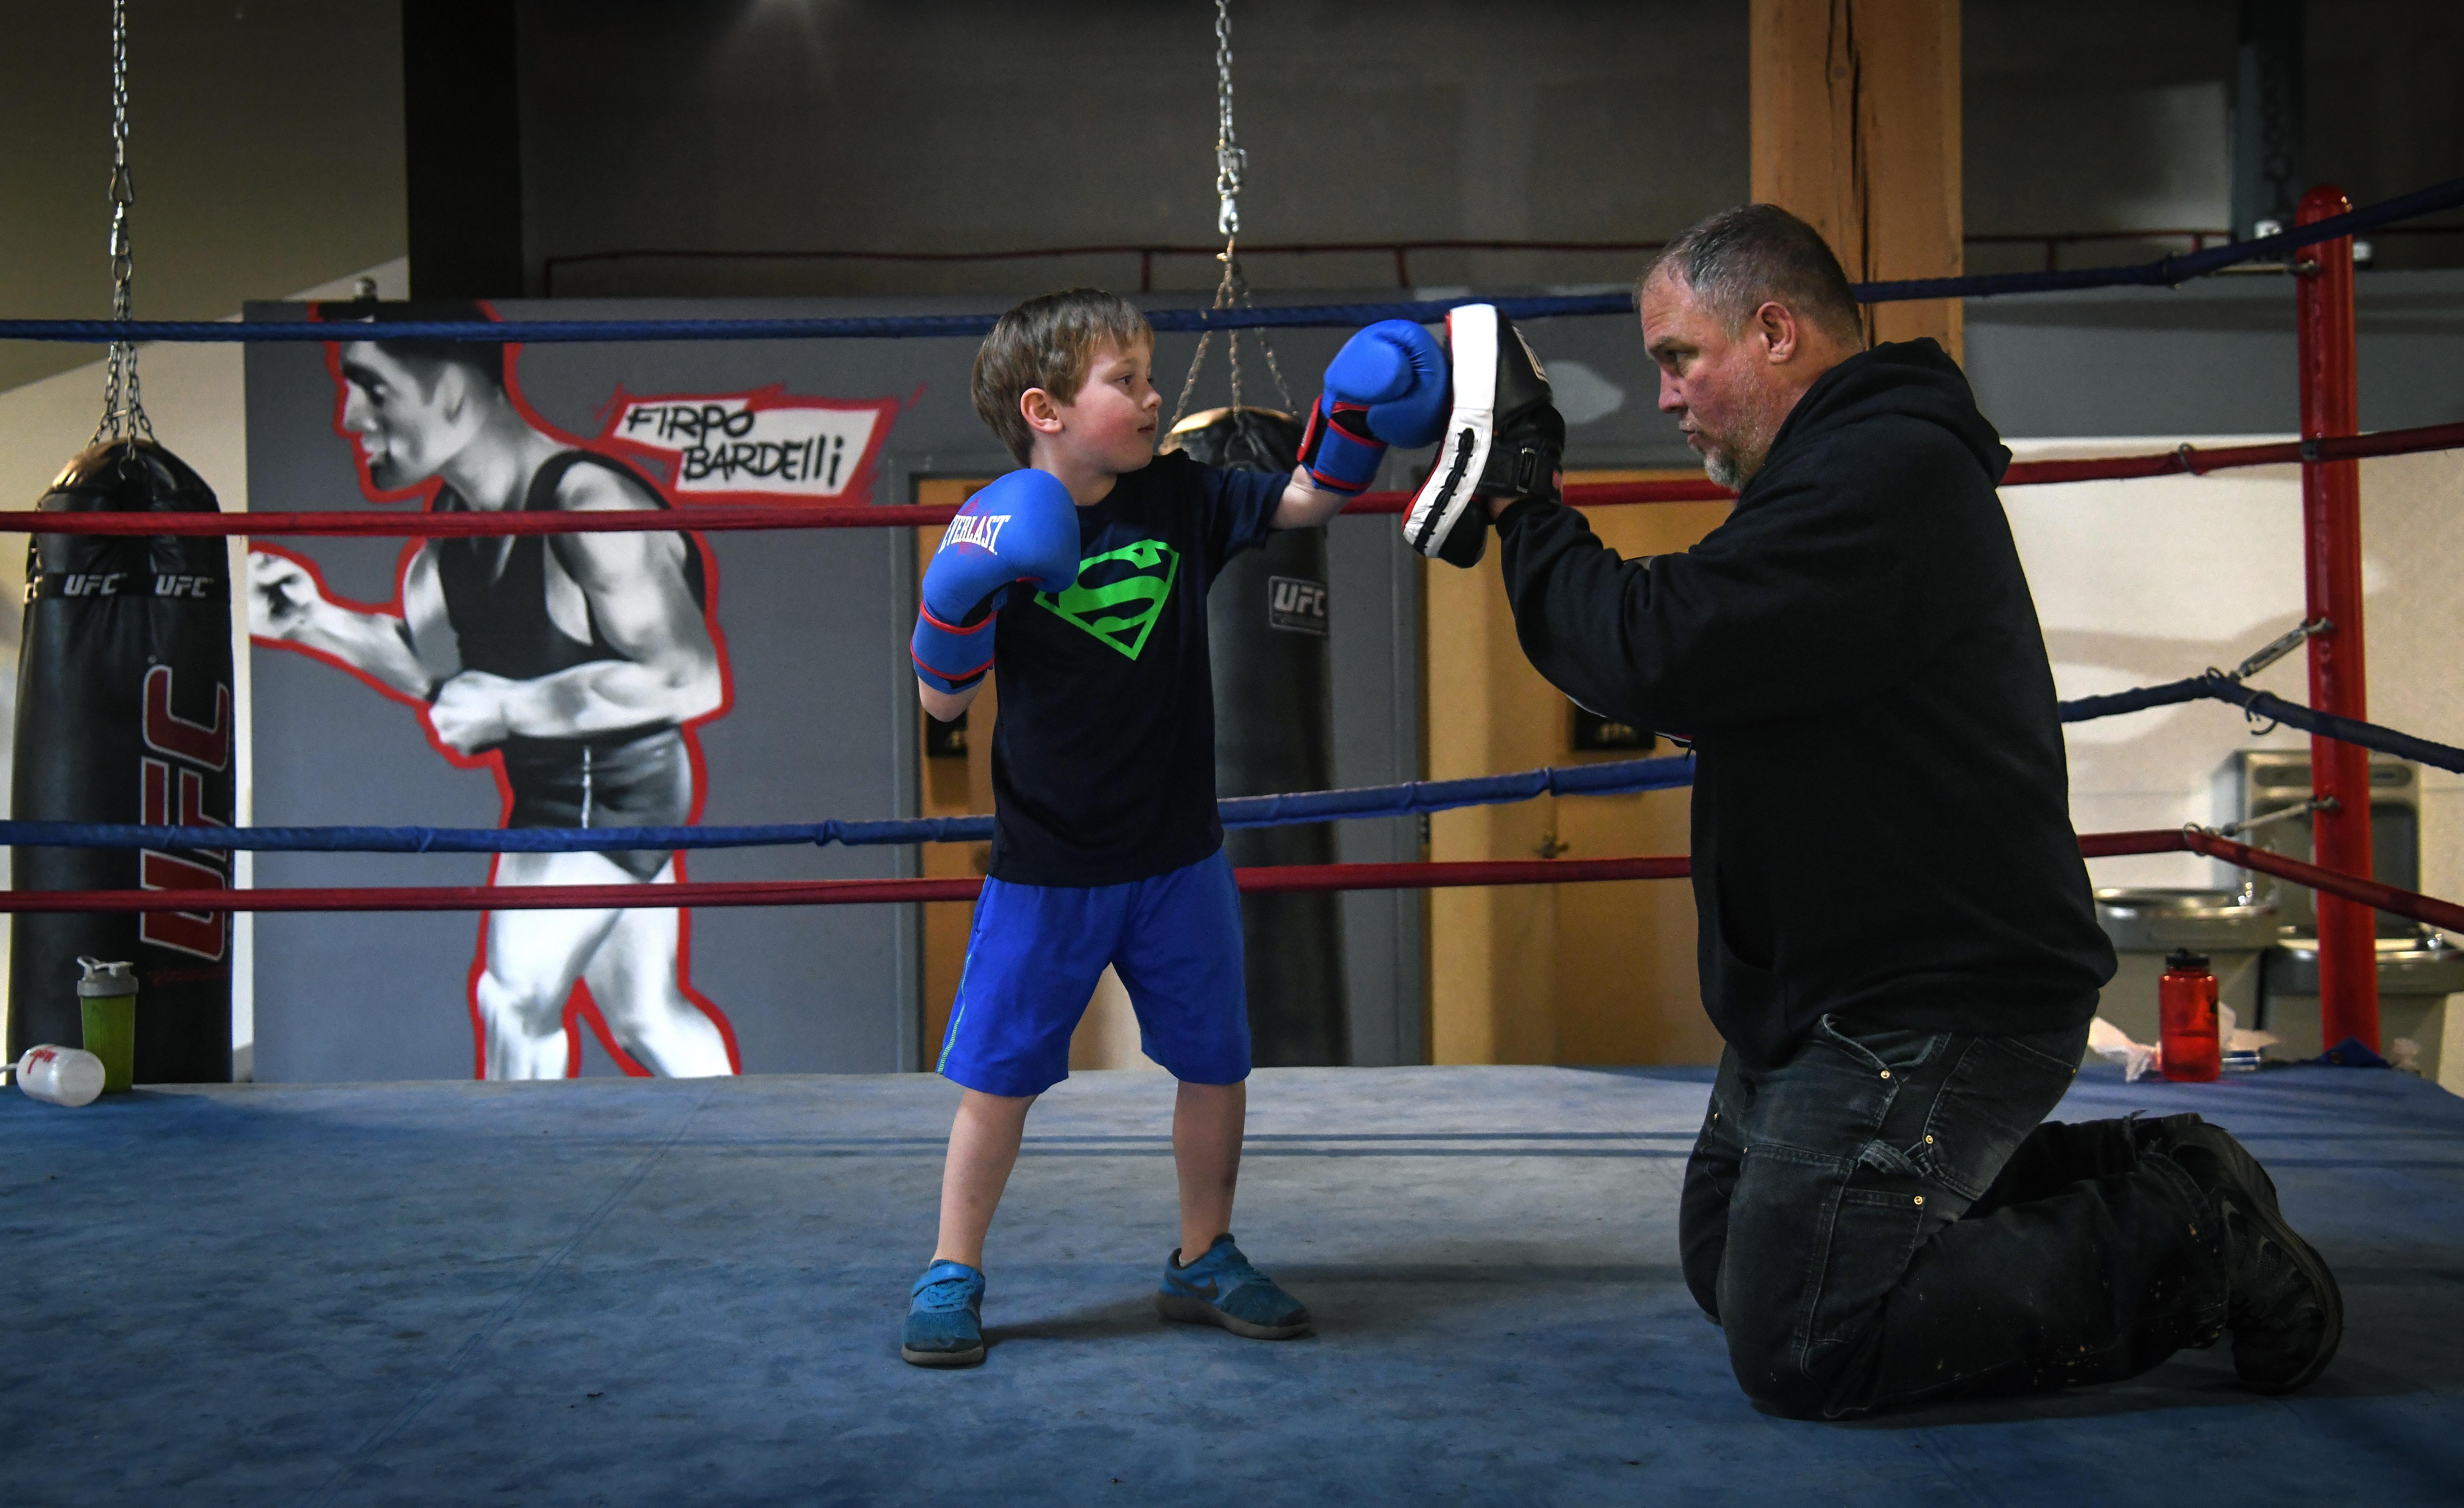 Year-round boxing, mentorship program puts Spokane police